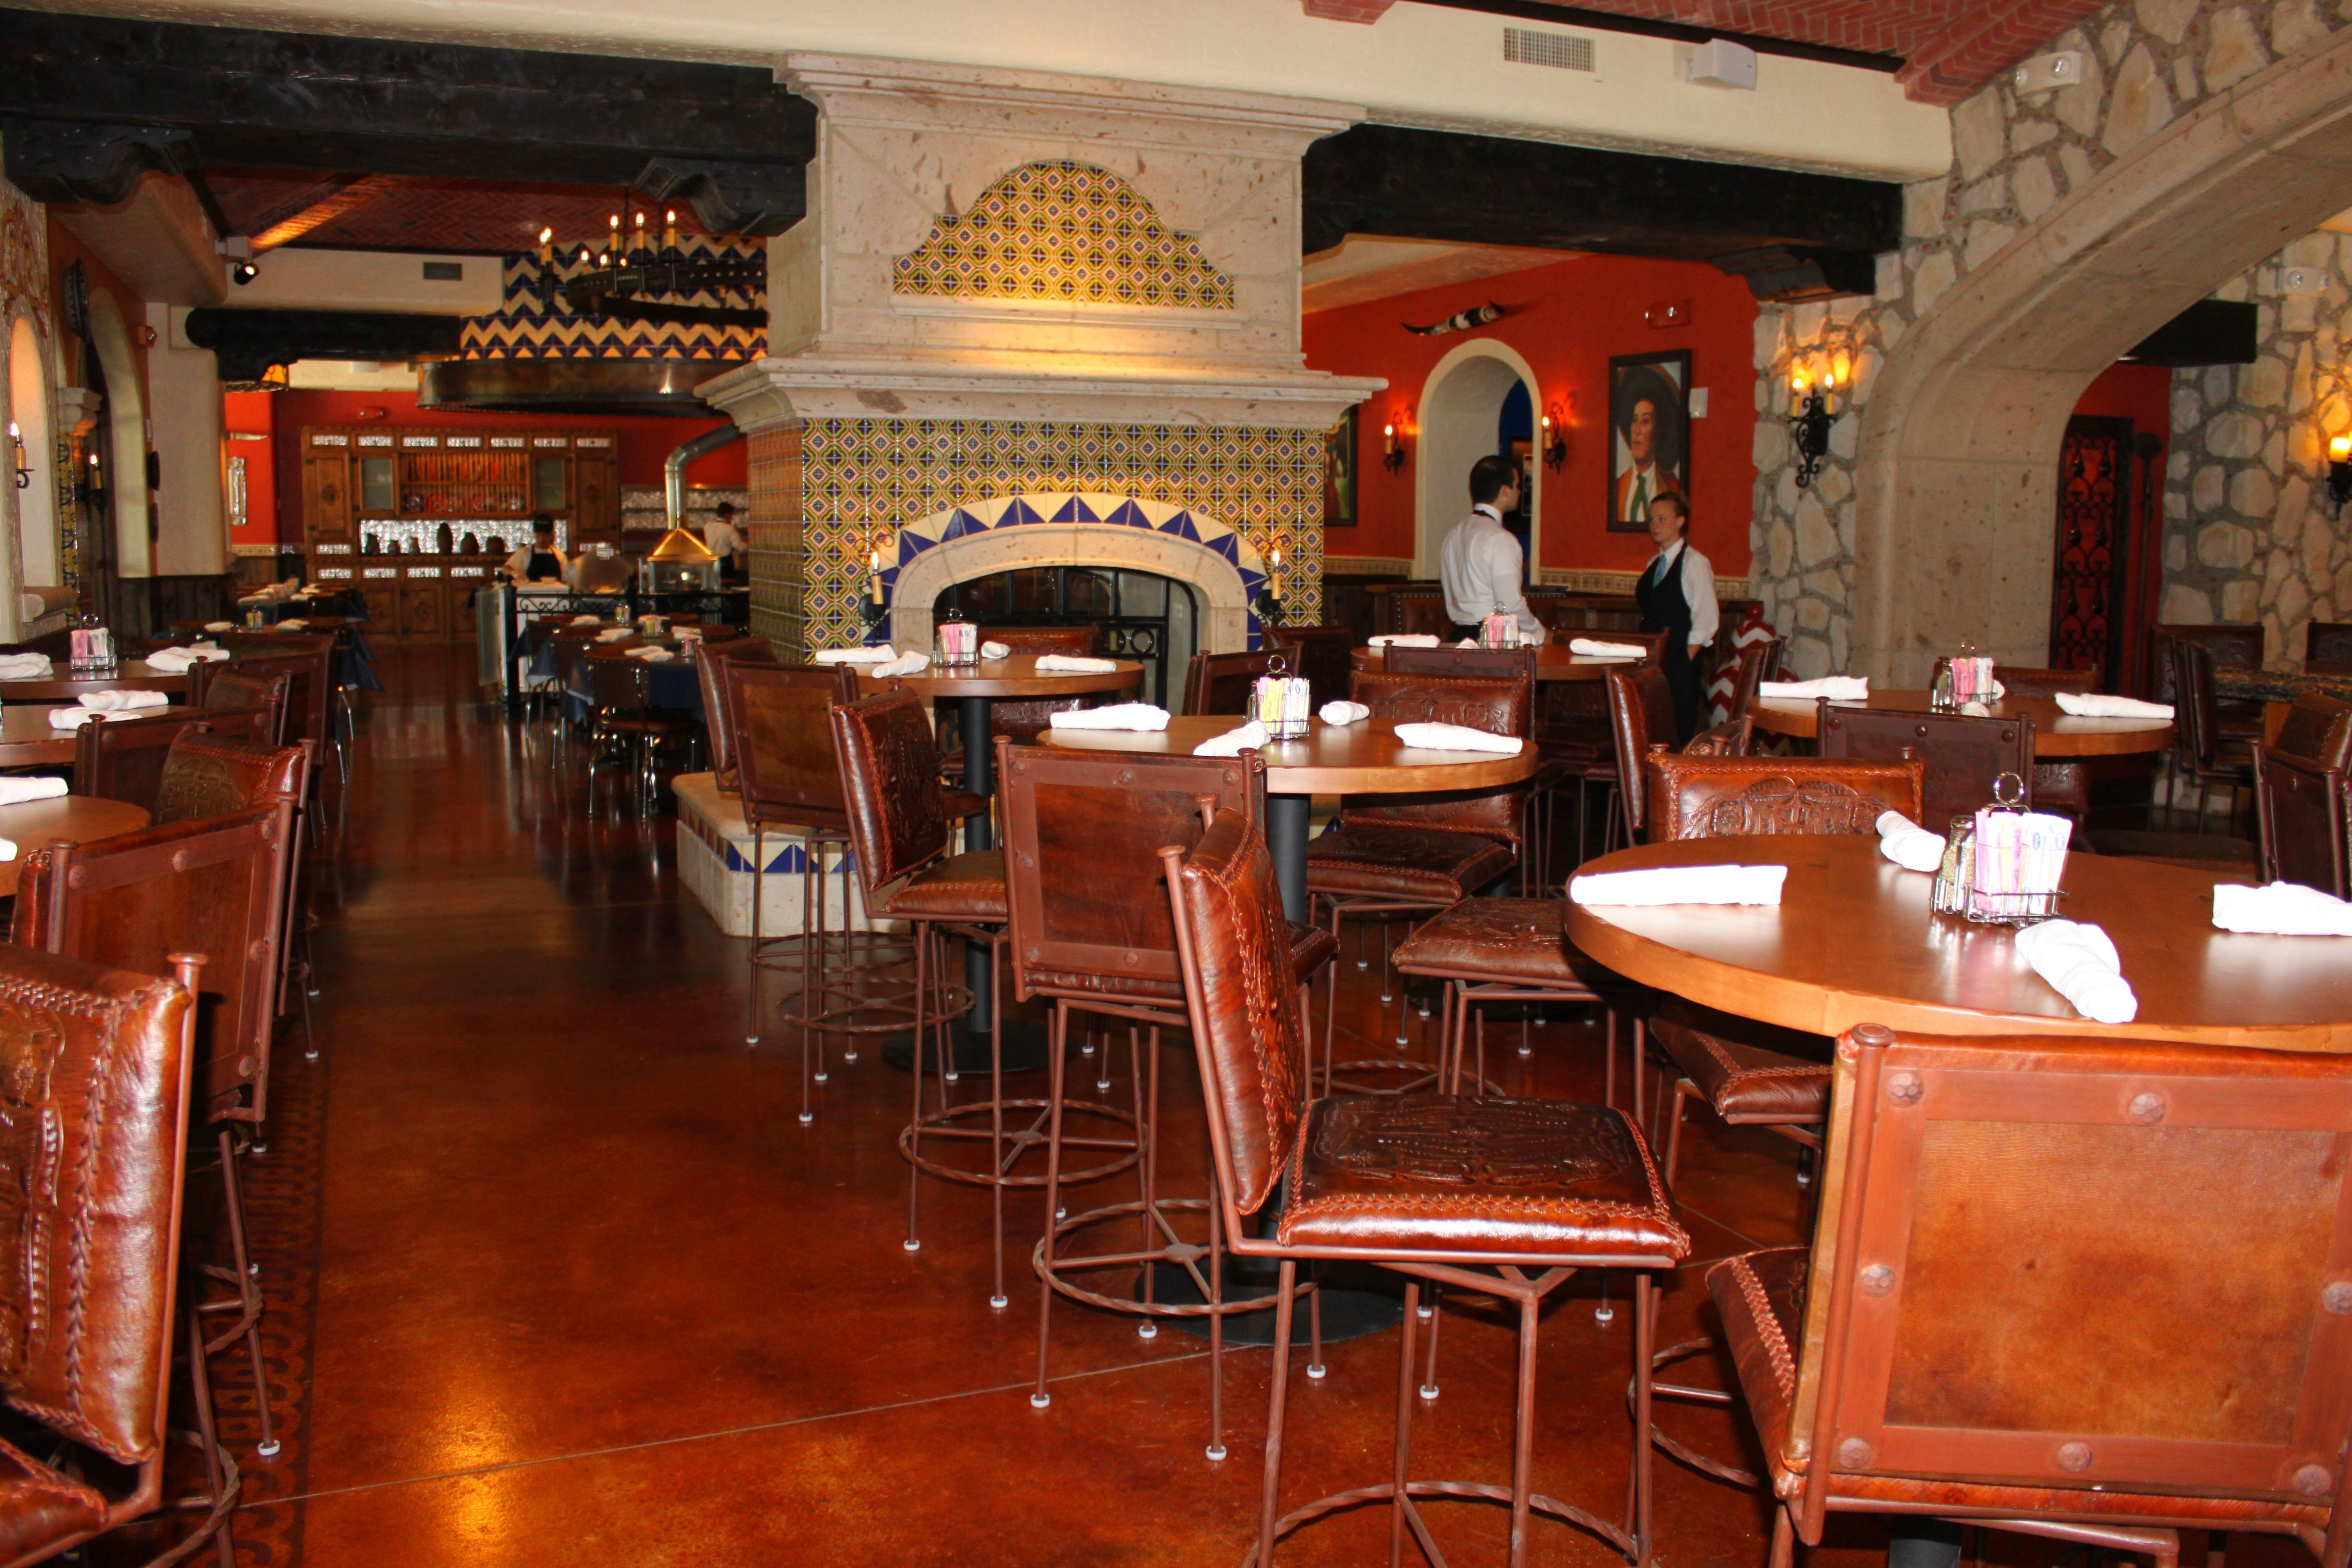 Uncle Julio's Restaurant - Austin Texas Bomanite Chemical Stain